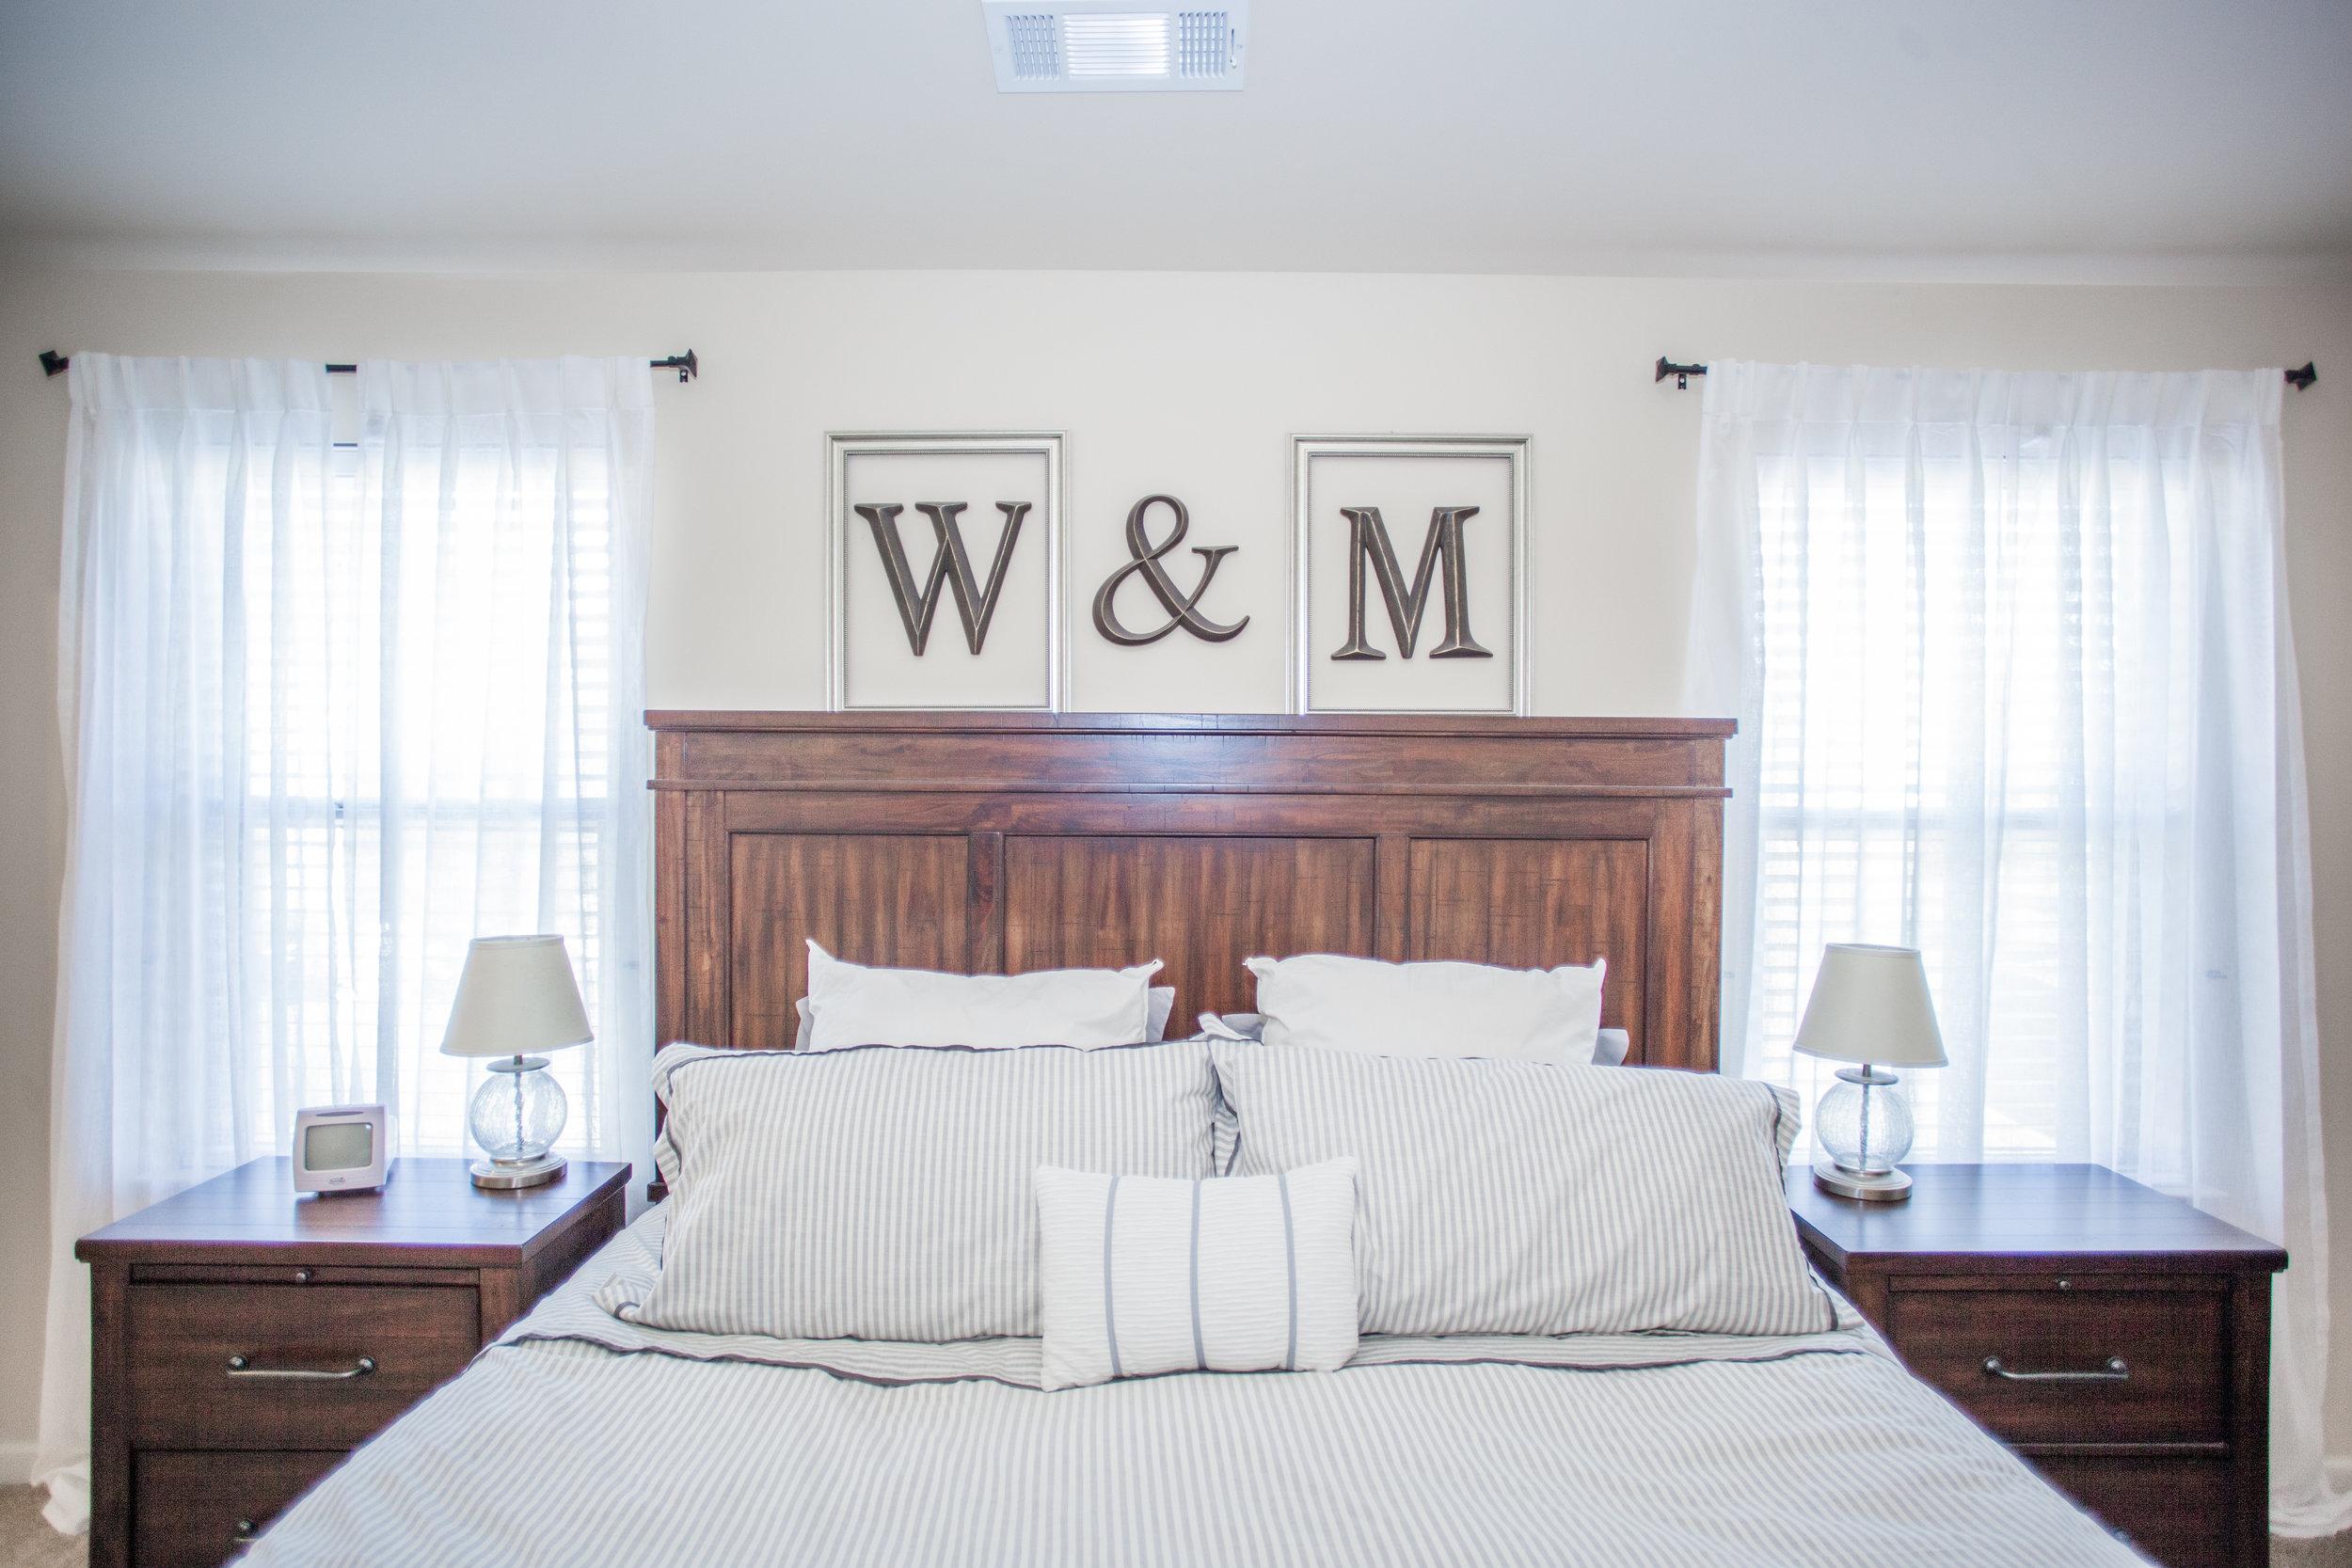 woodstock-ga-house-for-sale-wingard-real-estate-under-300k-20.jpg